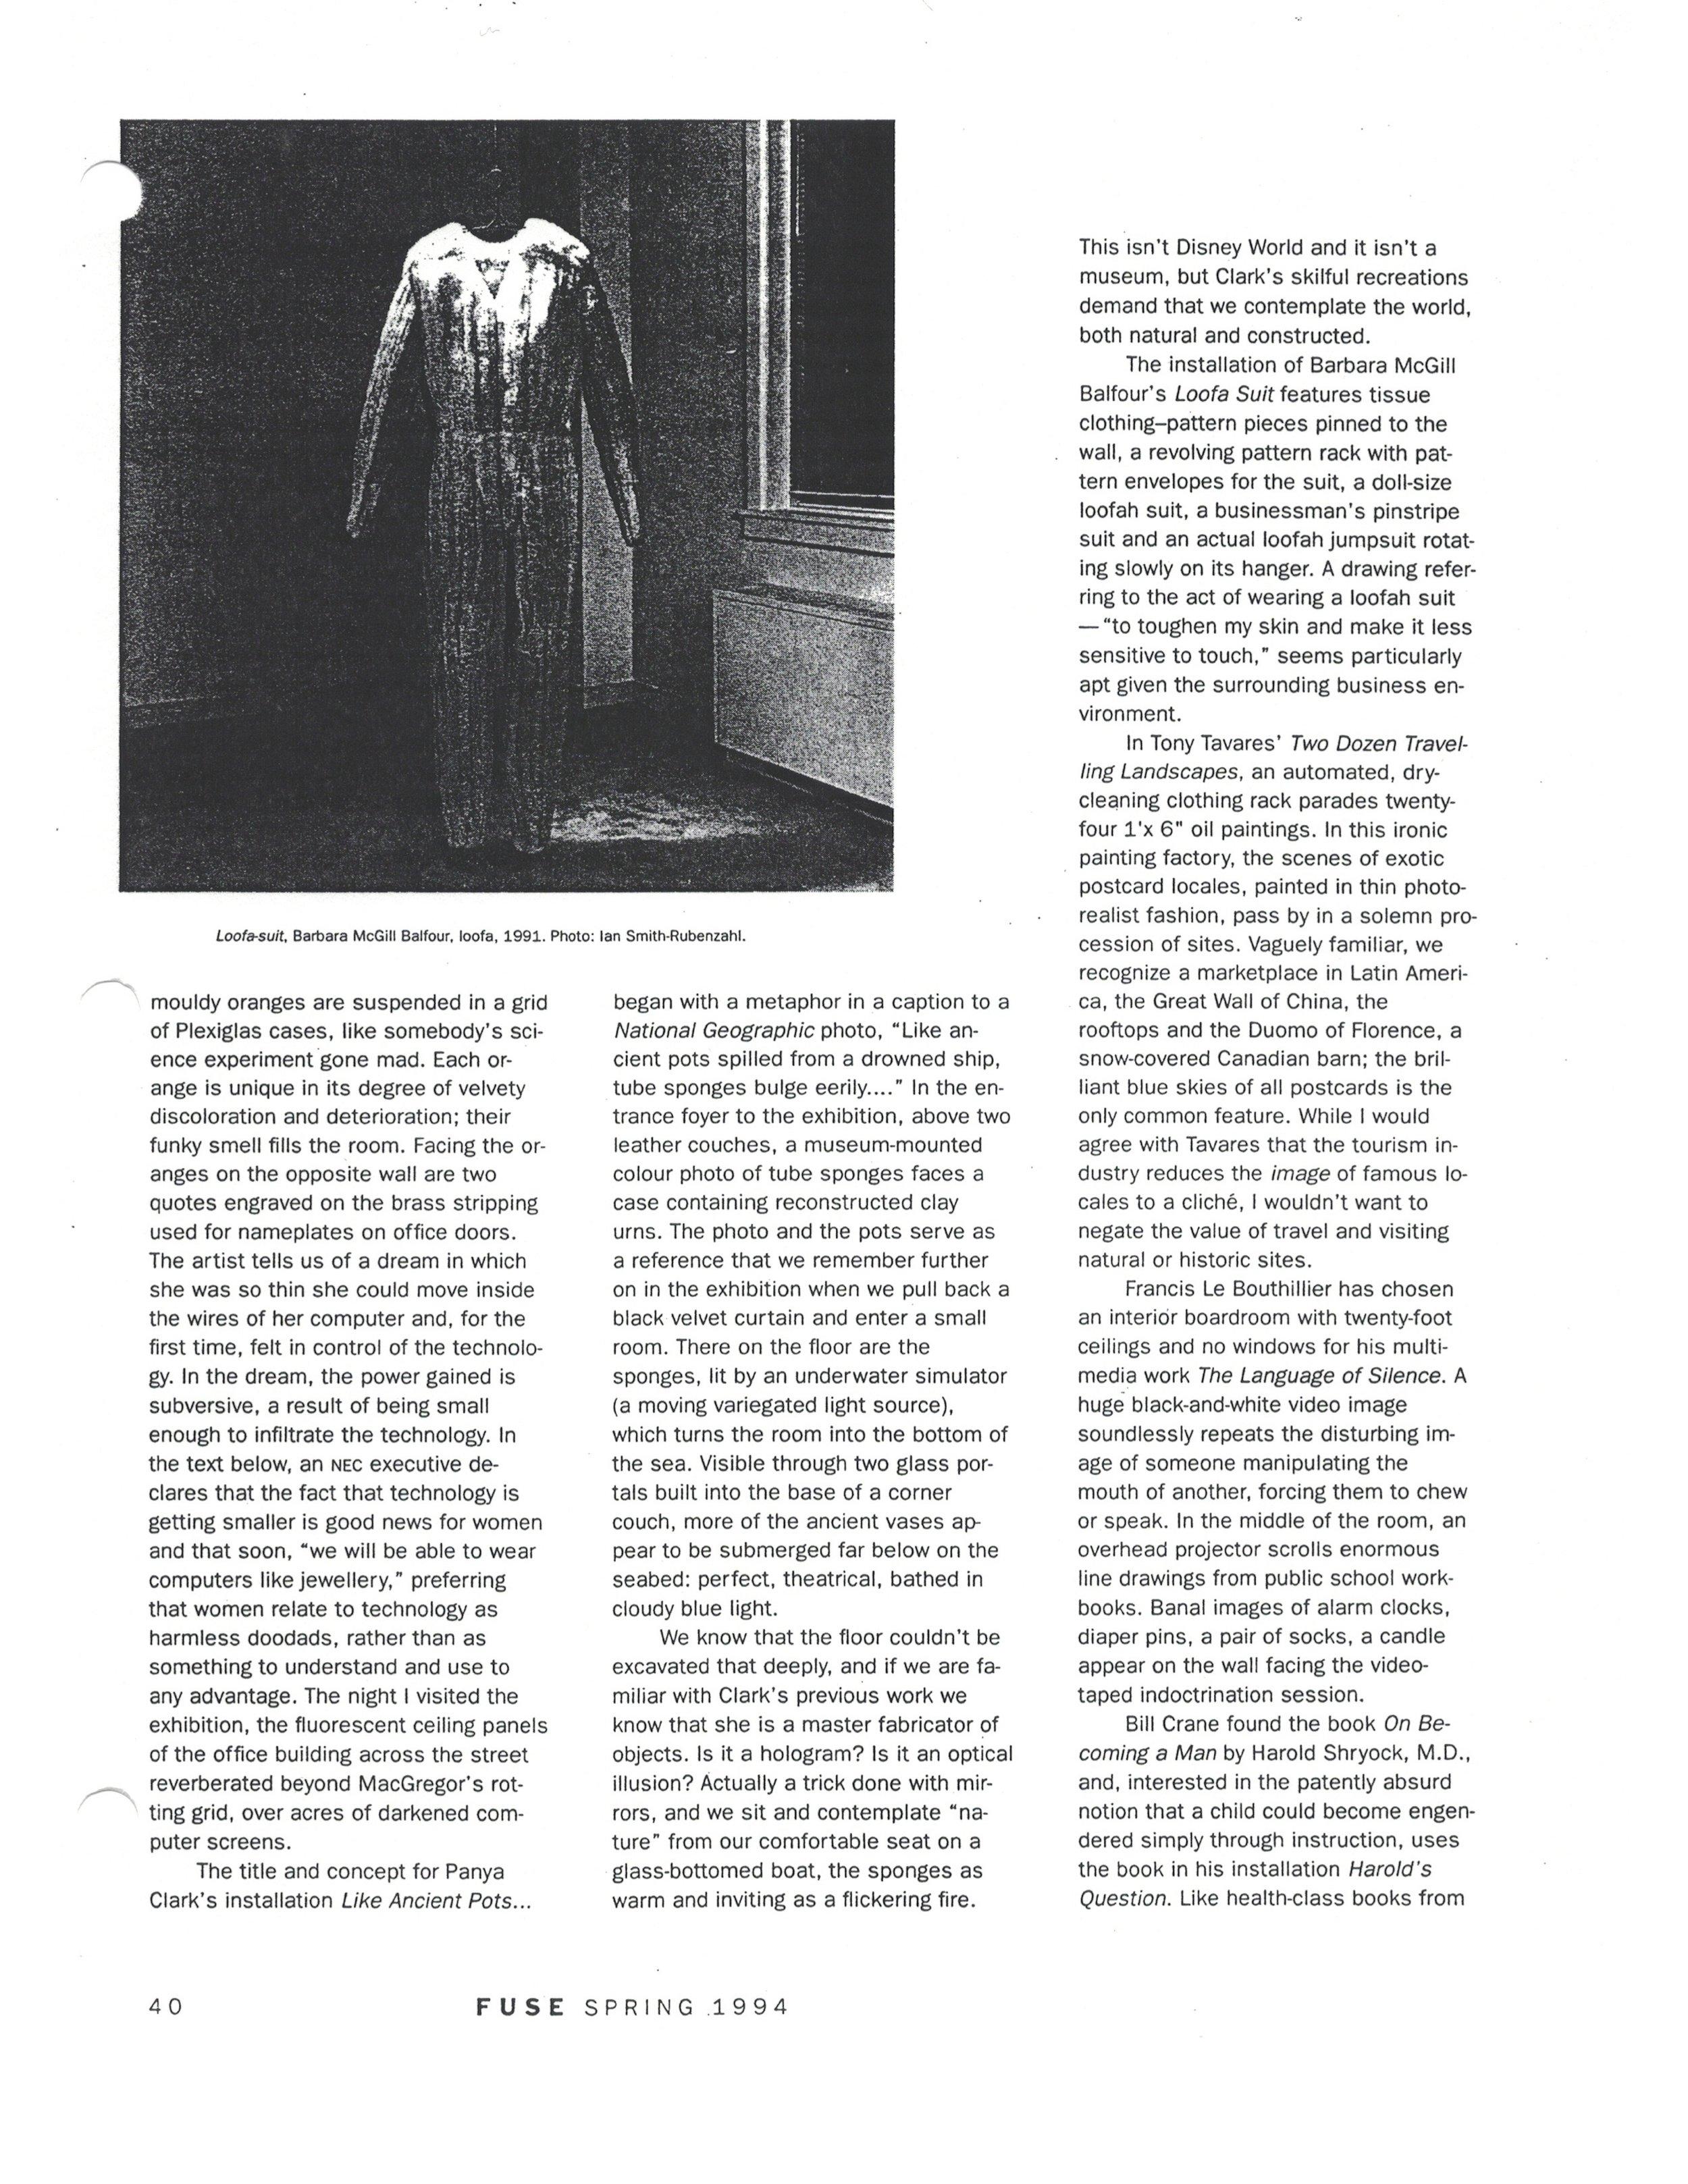 Fuse 1994 - Jennifer Rudder2.jpg